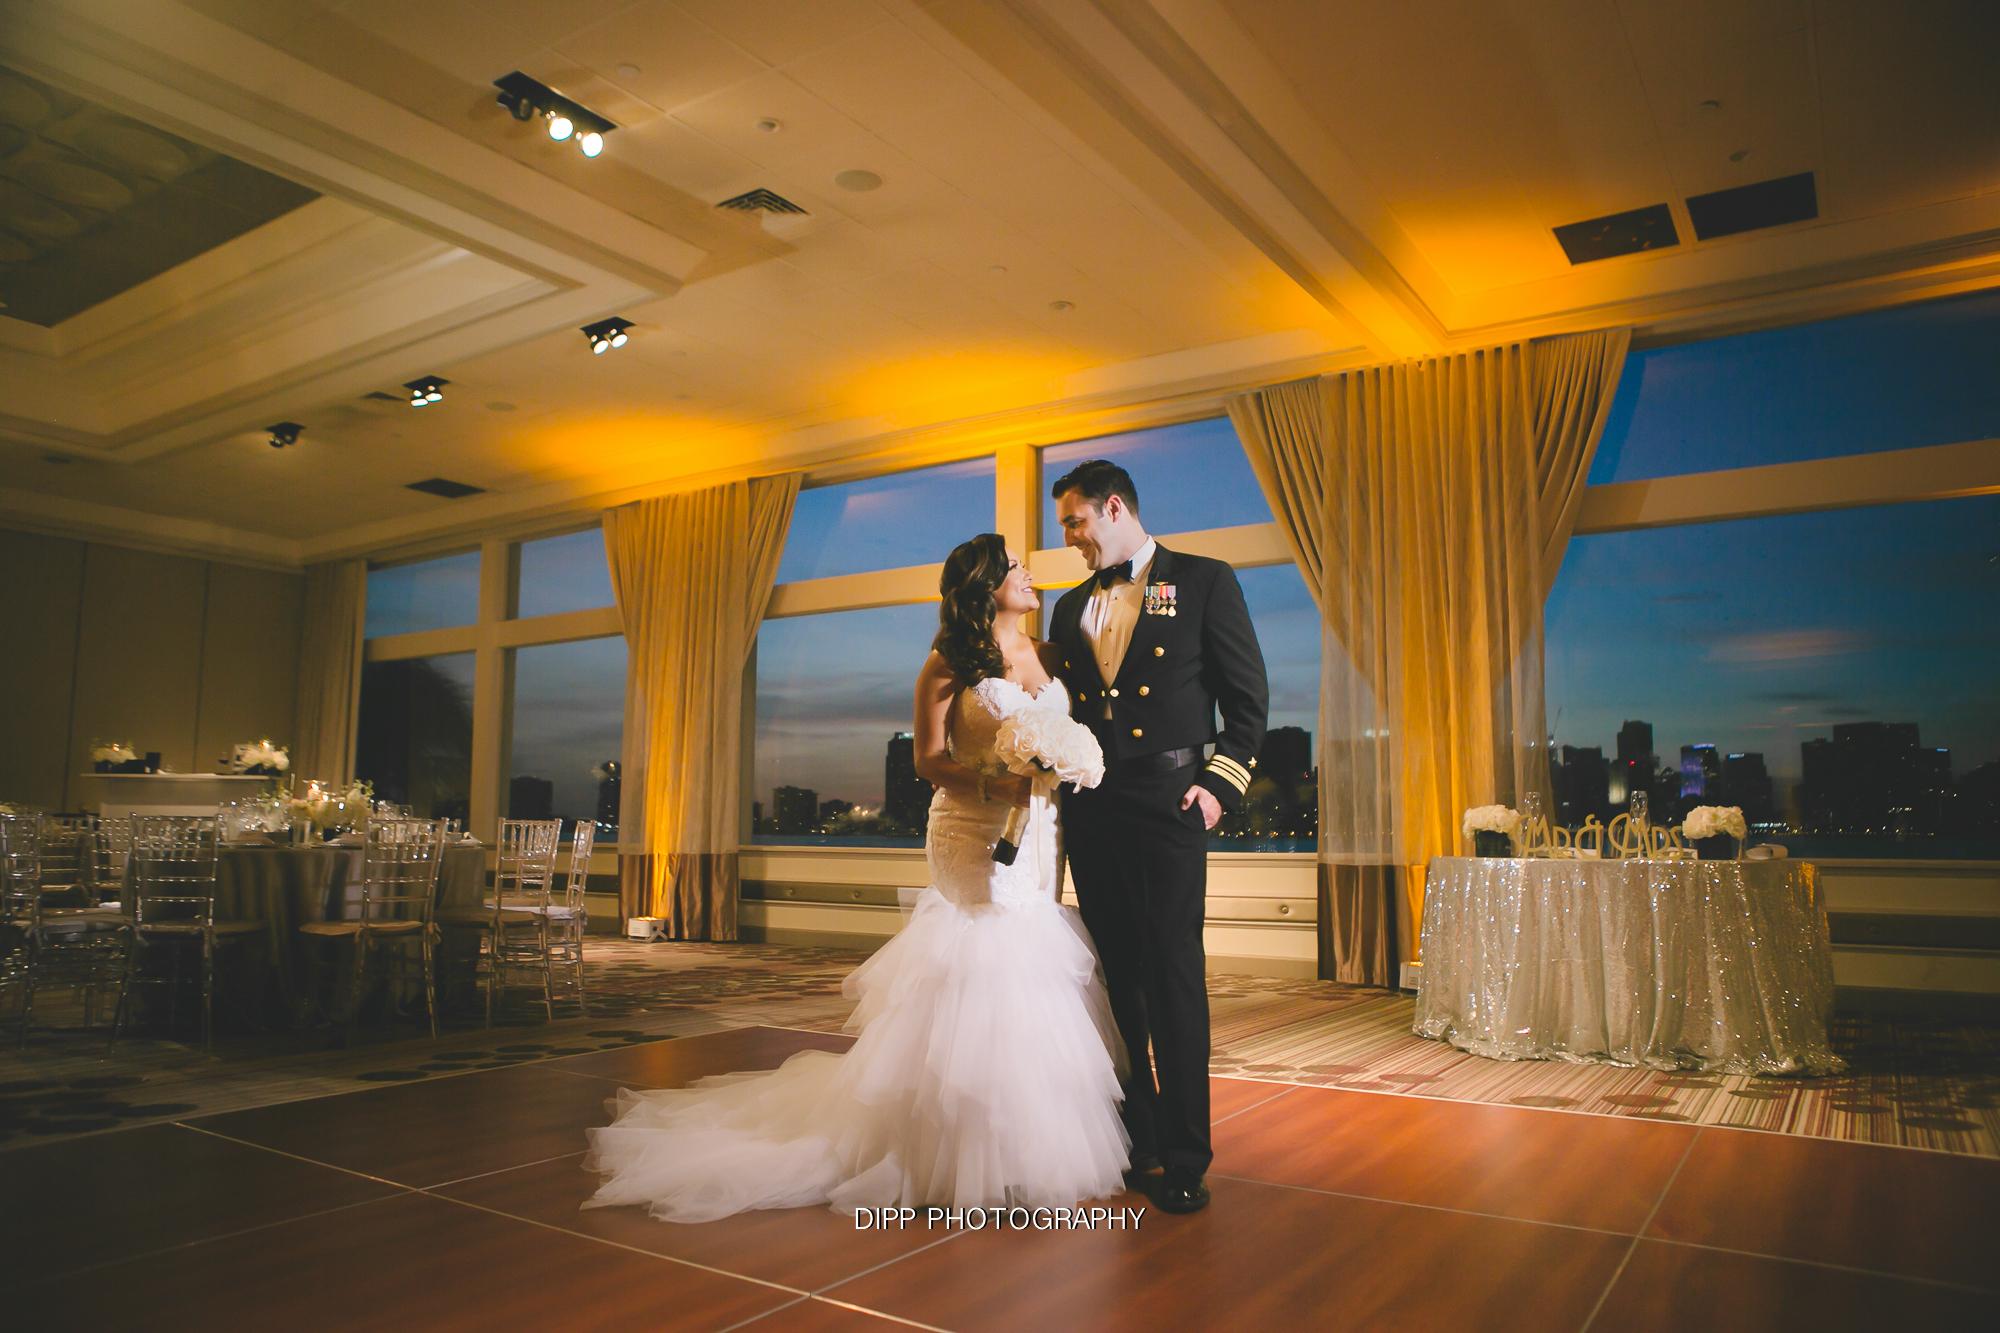 Dipp_2016 EDITED Sara & Brandon Wedding-366